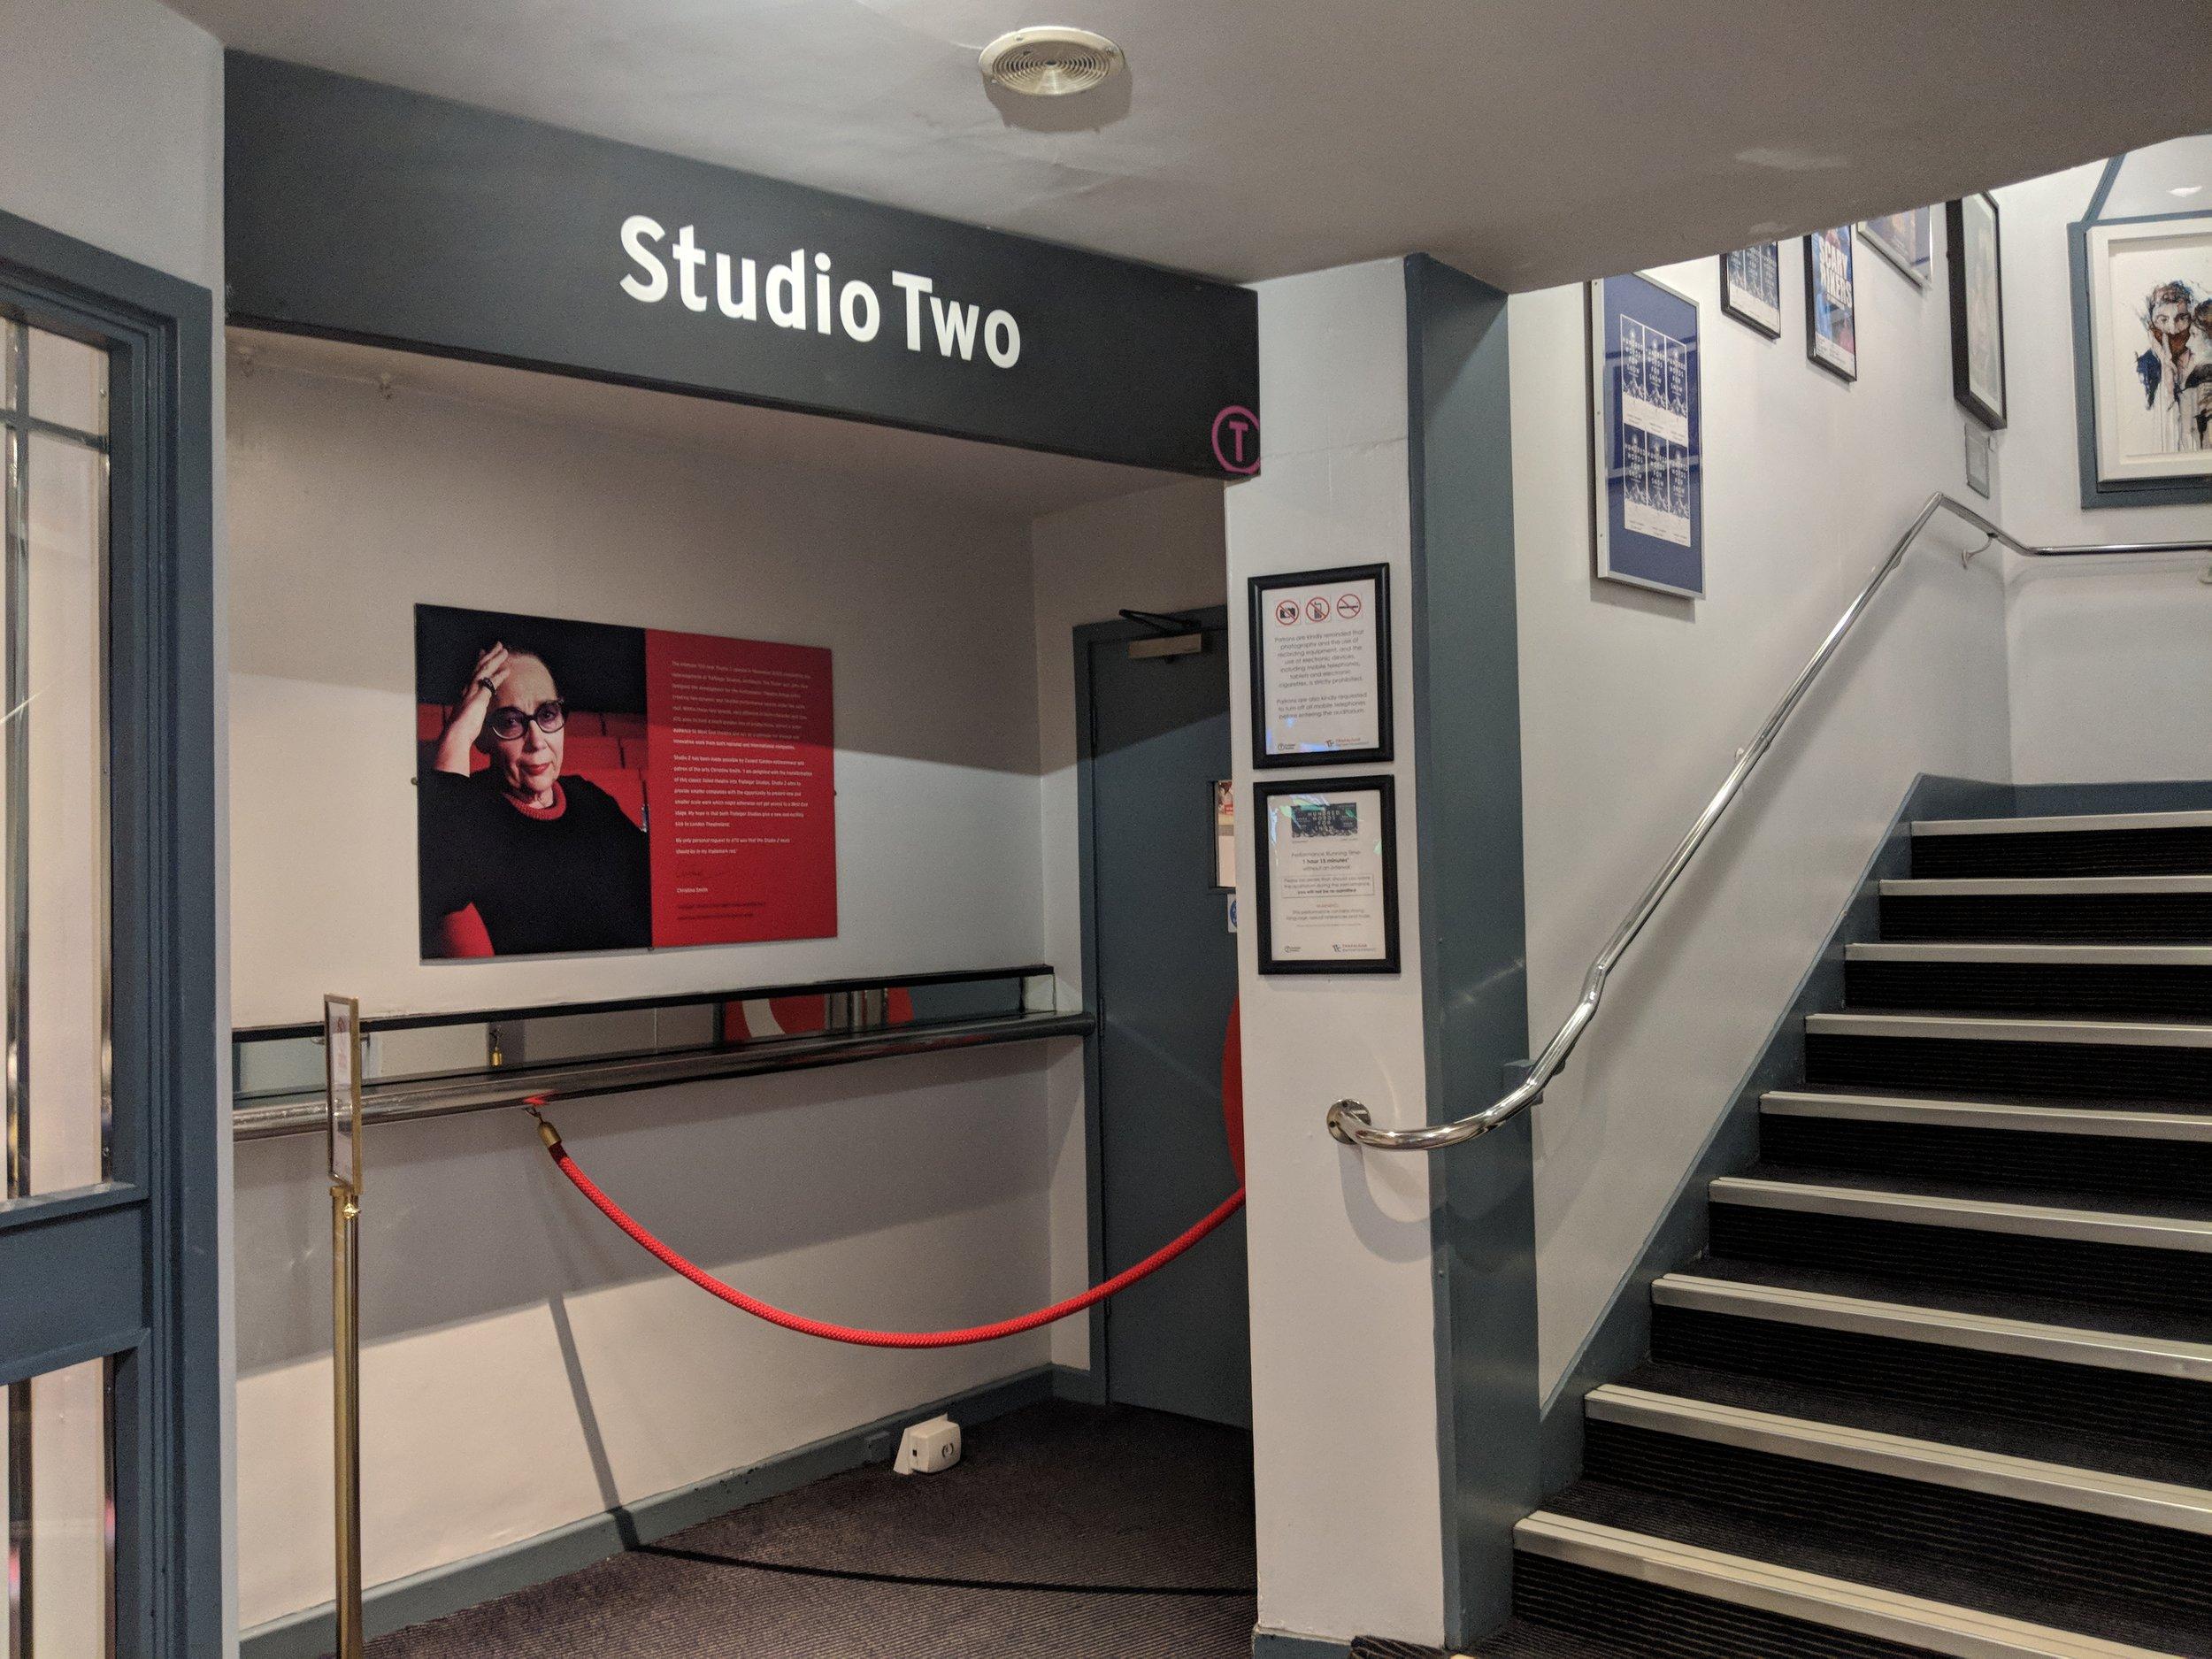 Trafalgar Studio Two - visited 28/03/2019